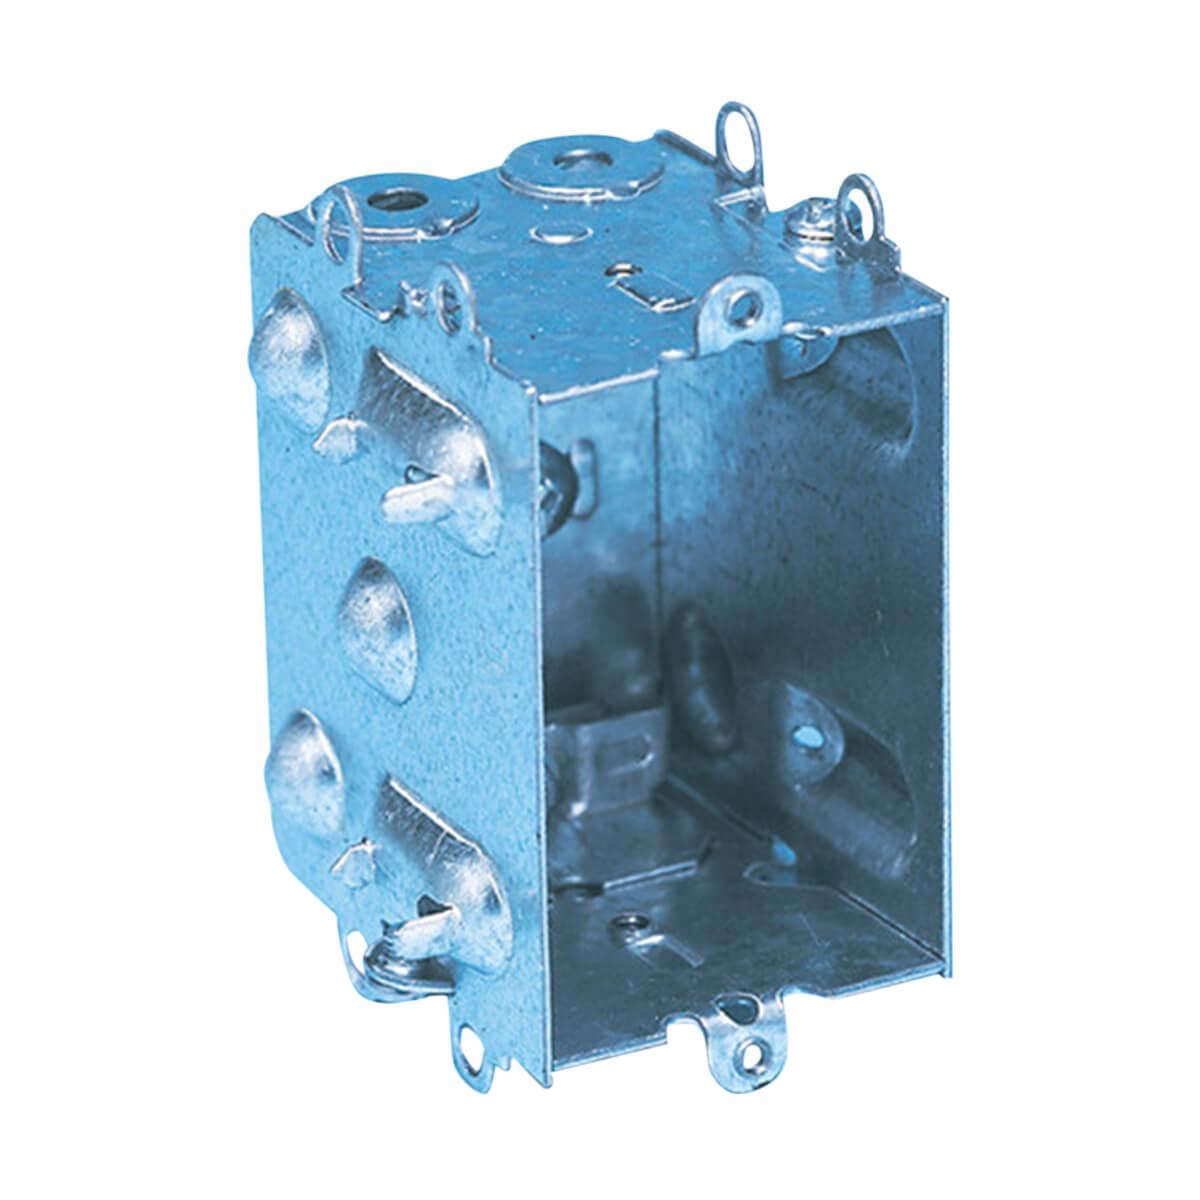 "Metal Electrical Box - 1104LH- 1-1/2"" deep"